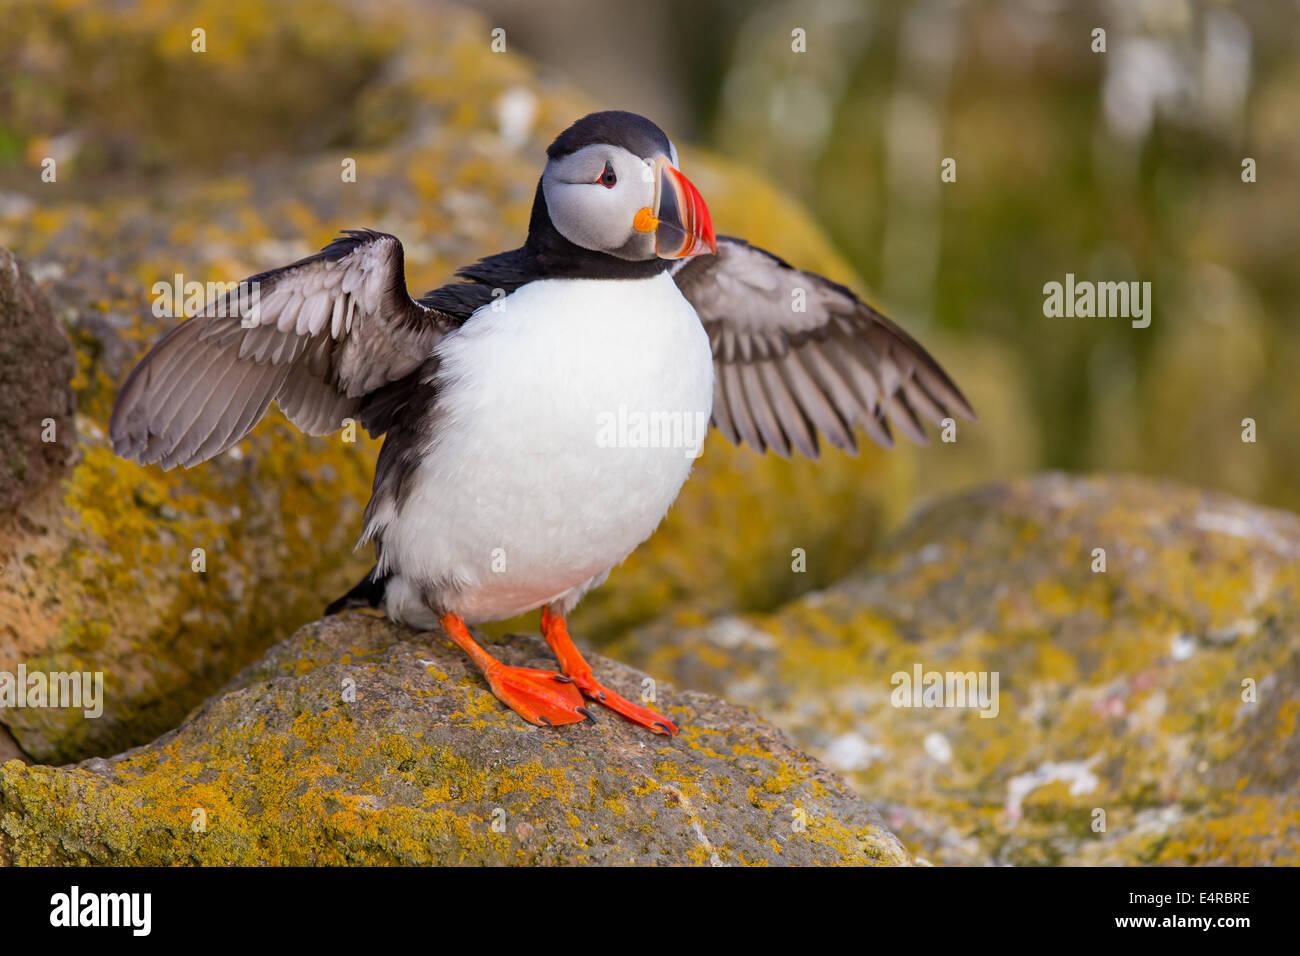 Parrot diver, Atlantic Puffin, Fratercula arctica , Papageitaucher, Atlantic Puffin, Fratercula arctica, Papageientaucher Stock Photo